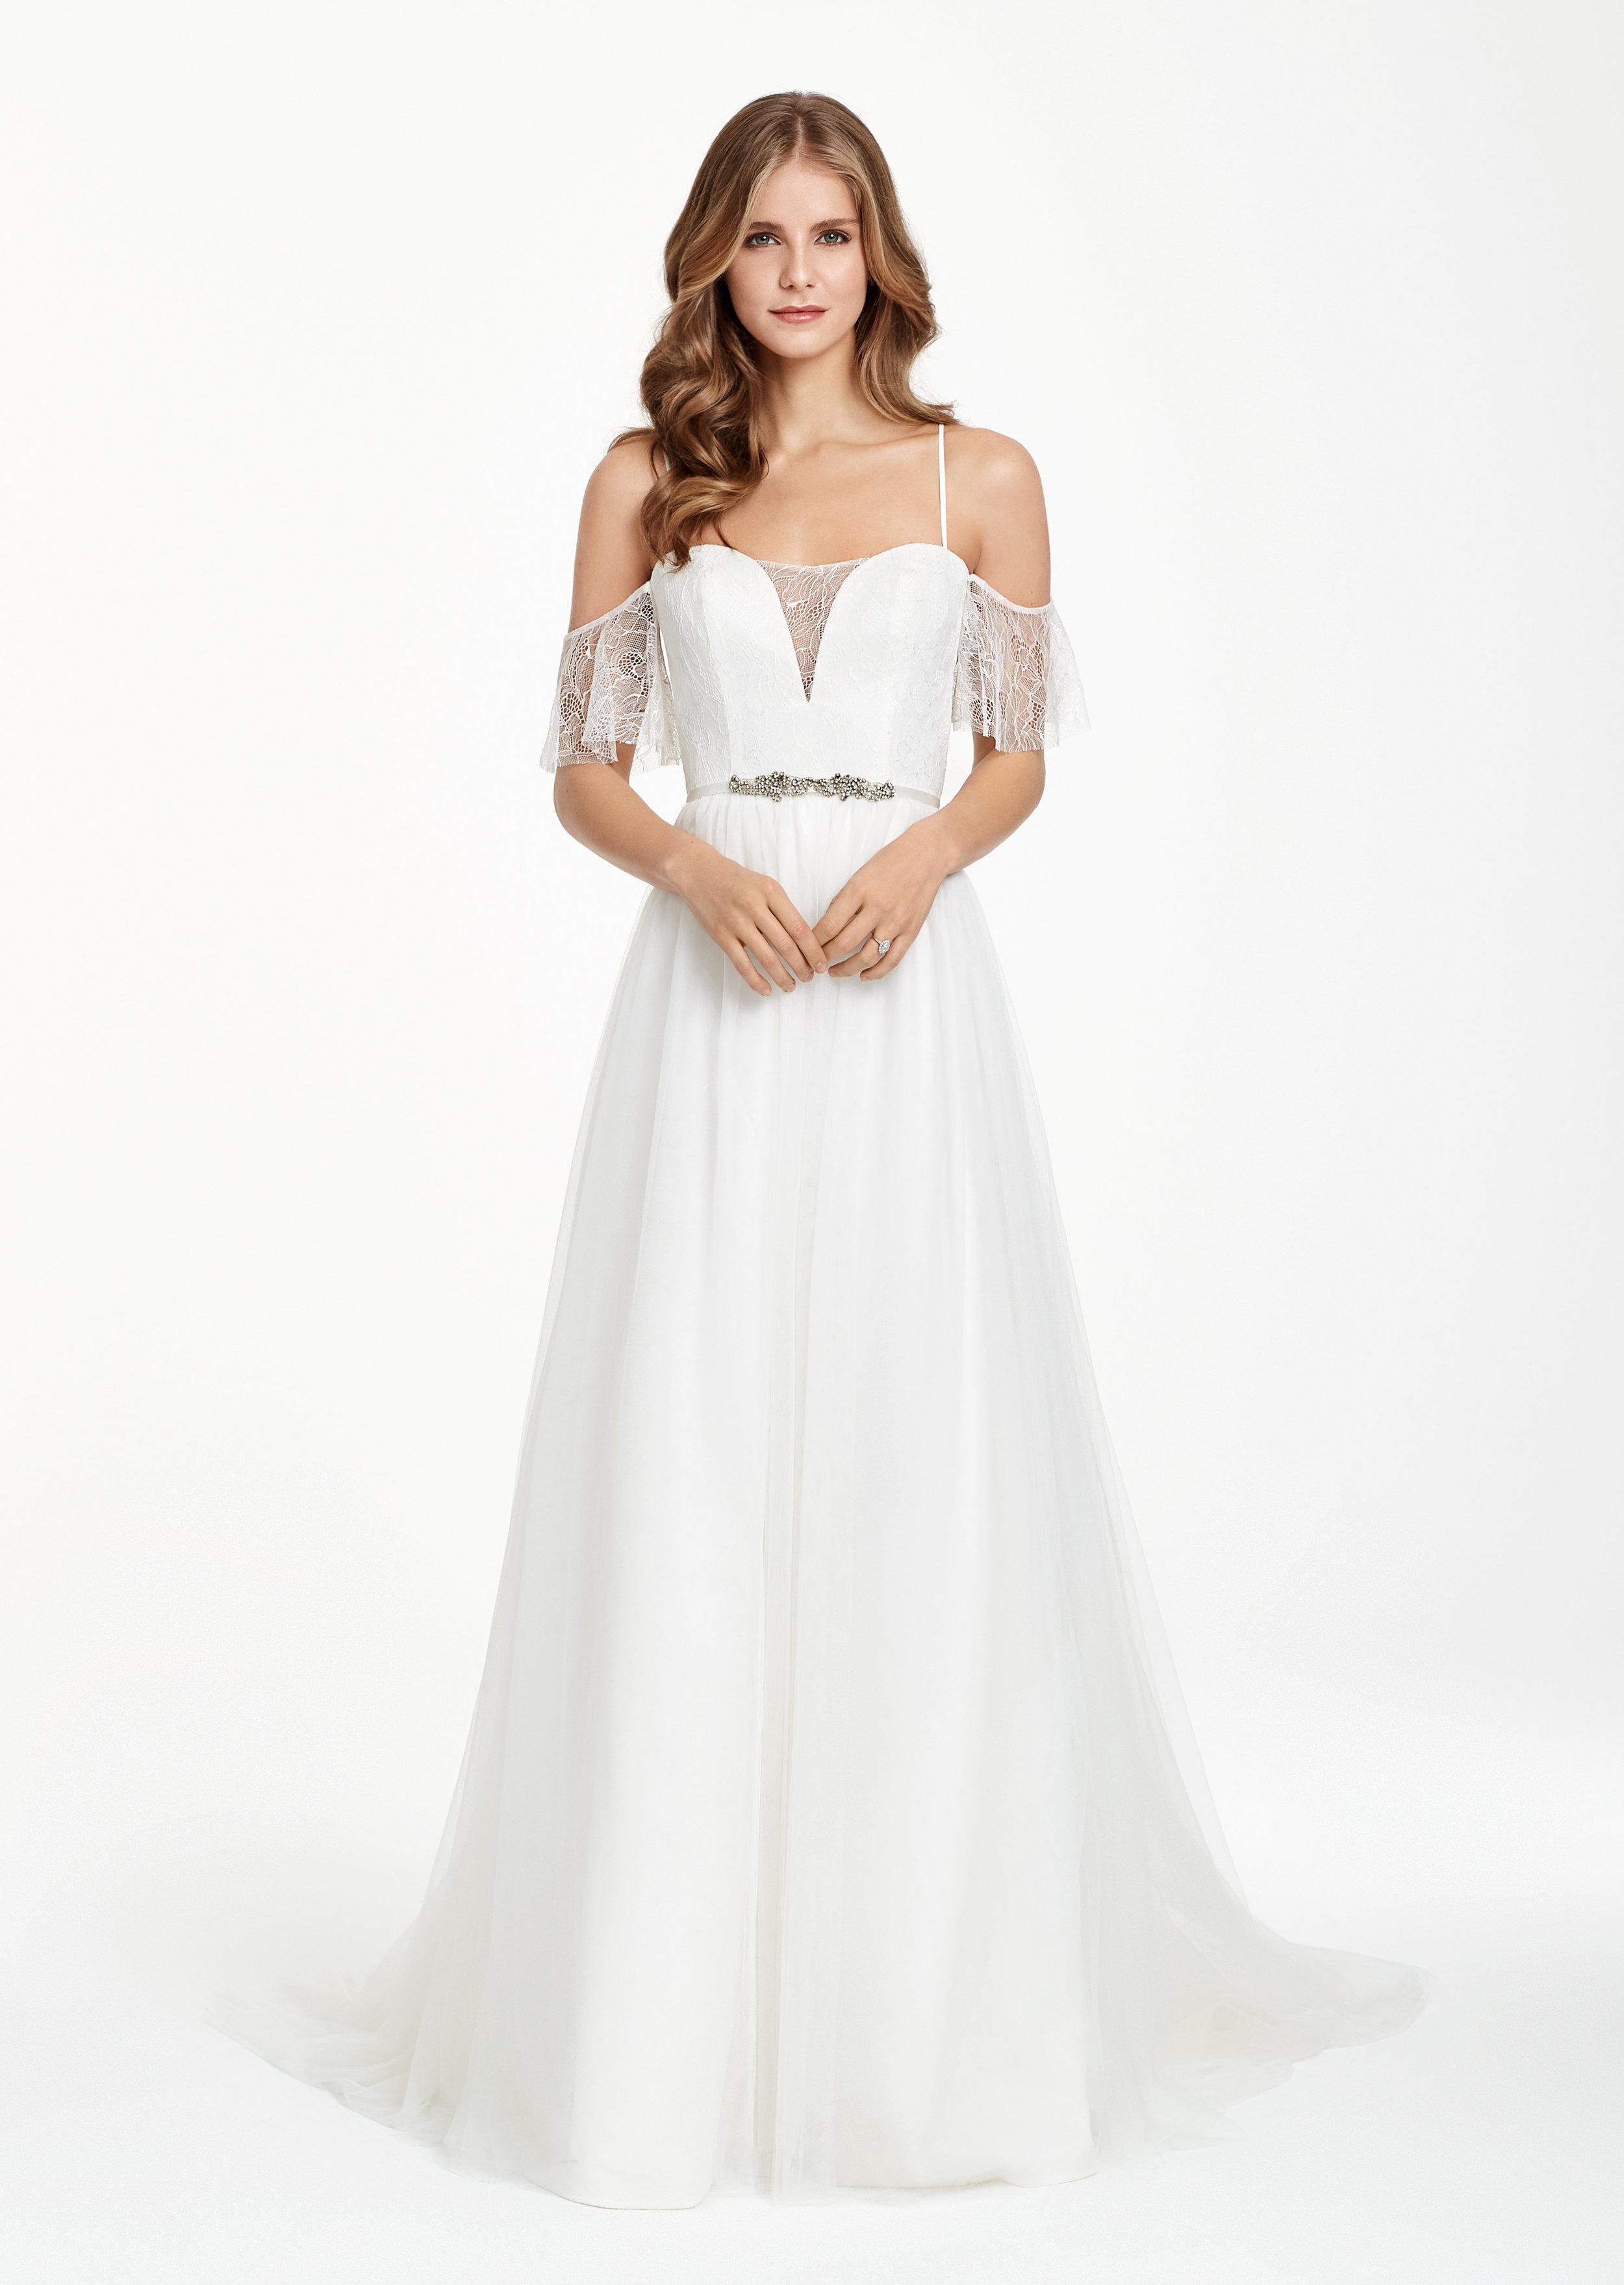 ivory-and-beau-bridal-boutique-zodiac-wedding-style-savannah-wedding-gowns-savannah-wedding-dresses-earnest-loans-11.jpg